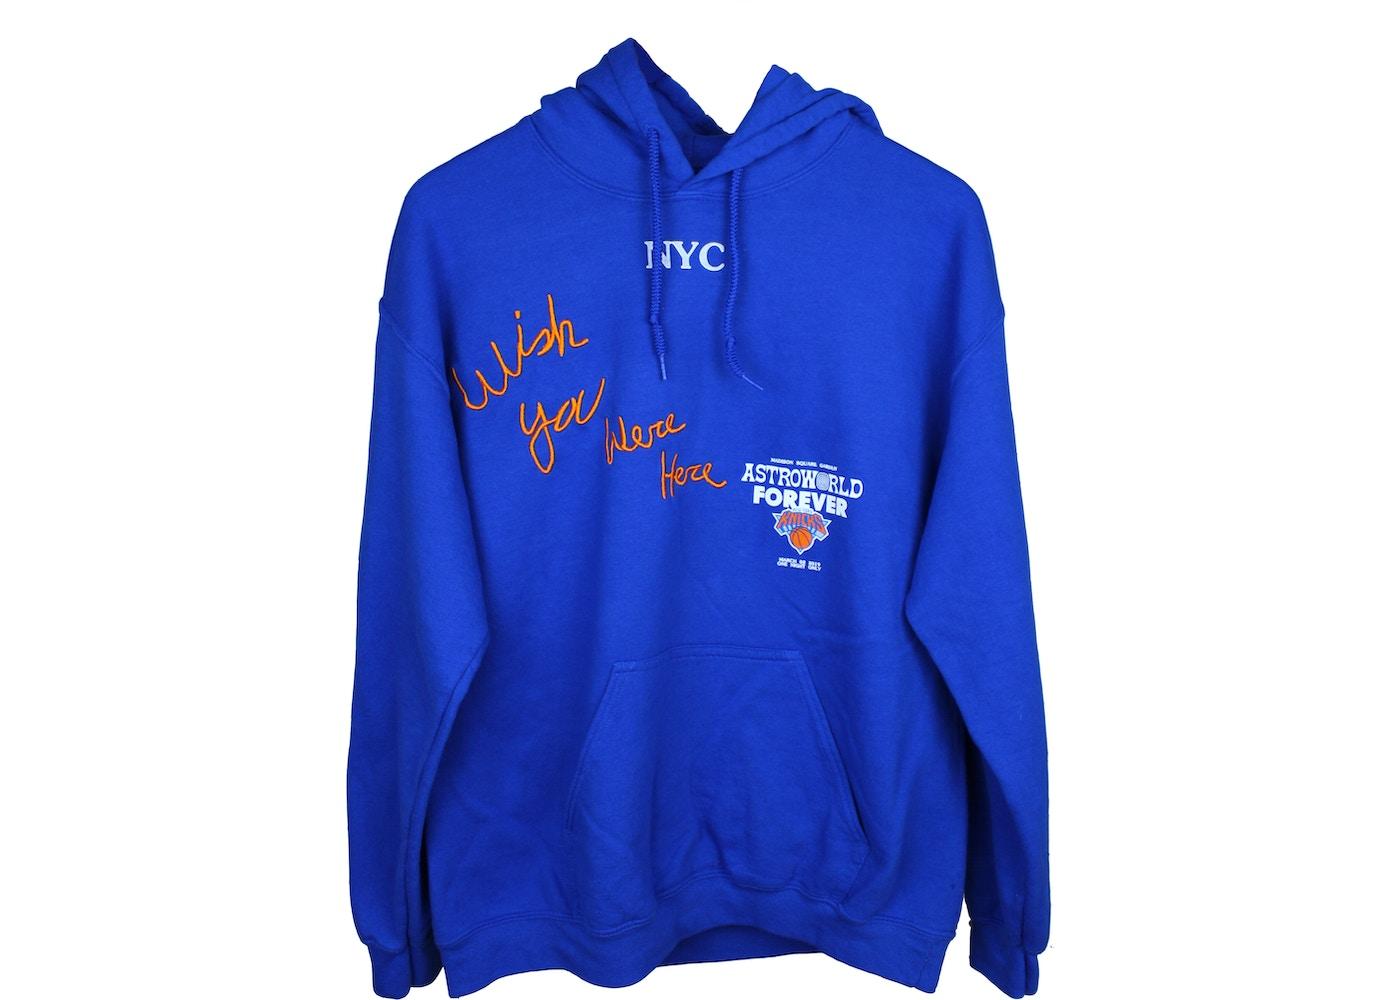 ed86ab0da34f Travis Scott Astroworld MSG Knicks Hoodie Blue - SS19